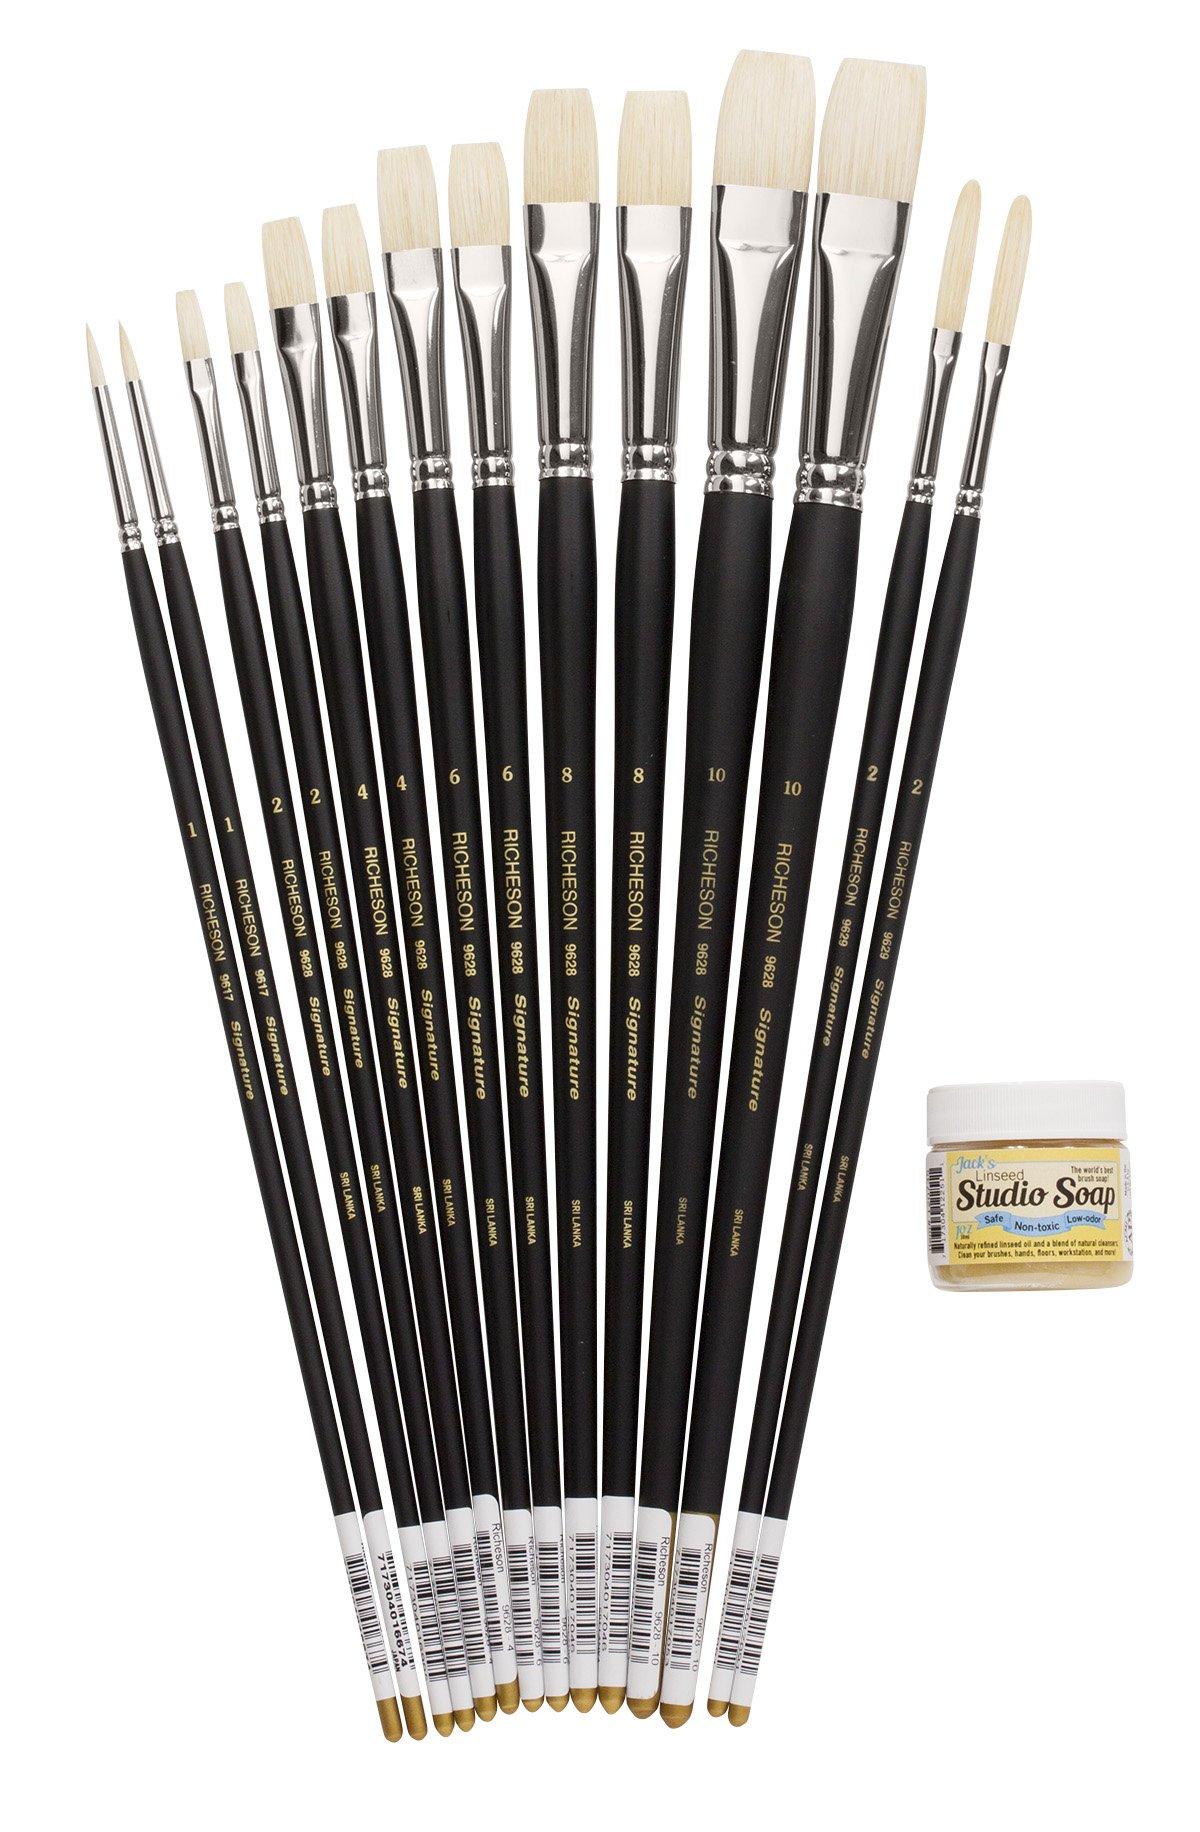 Joe Paquet JP001 Signature Oil Paint Brush Kit